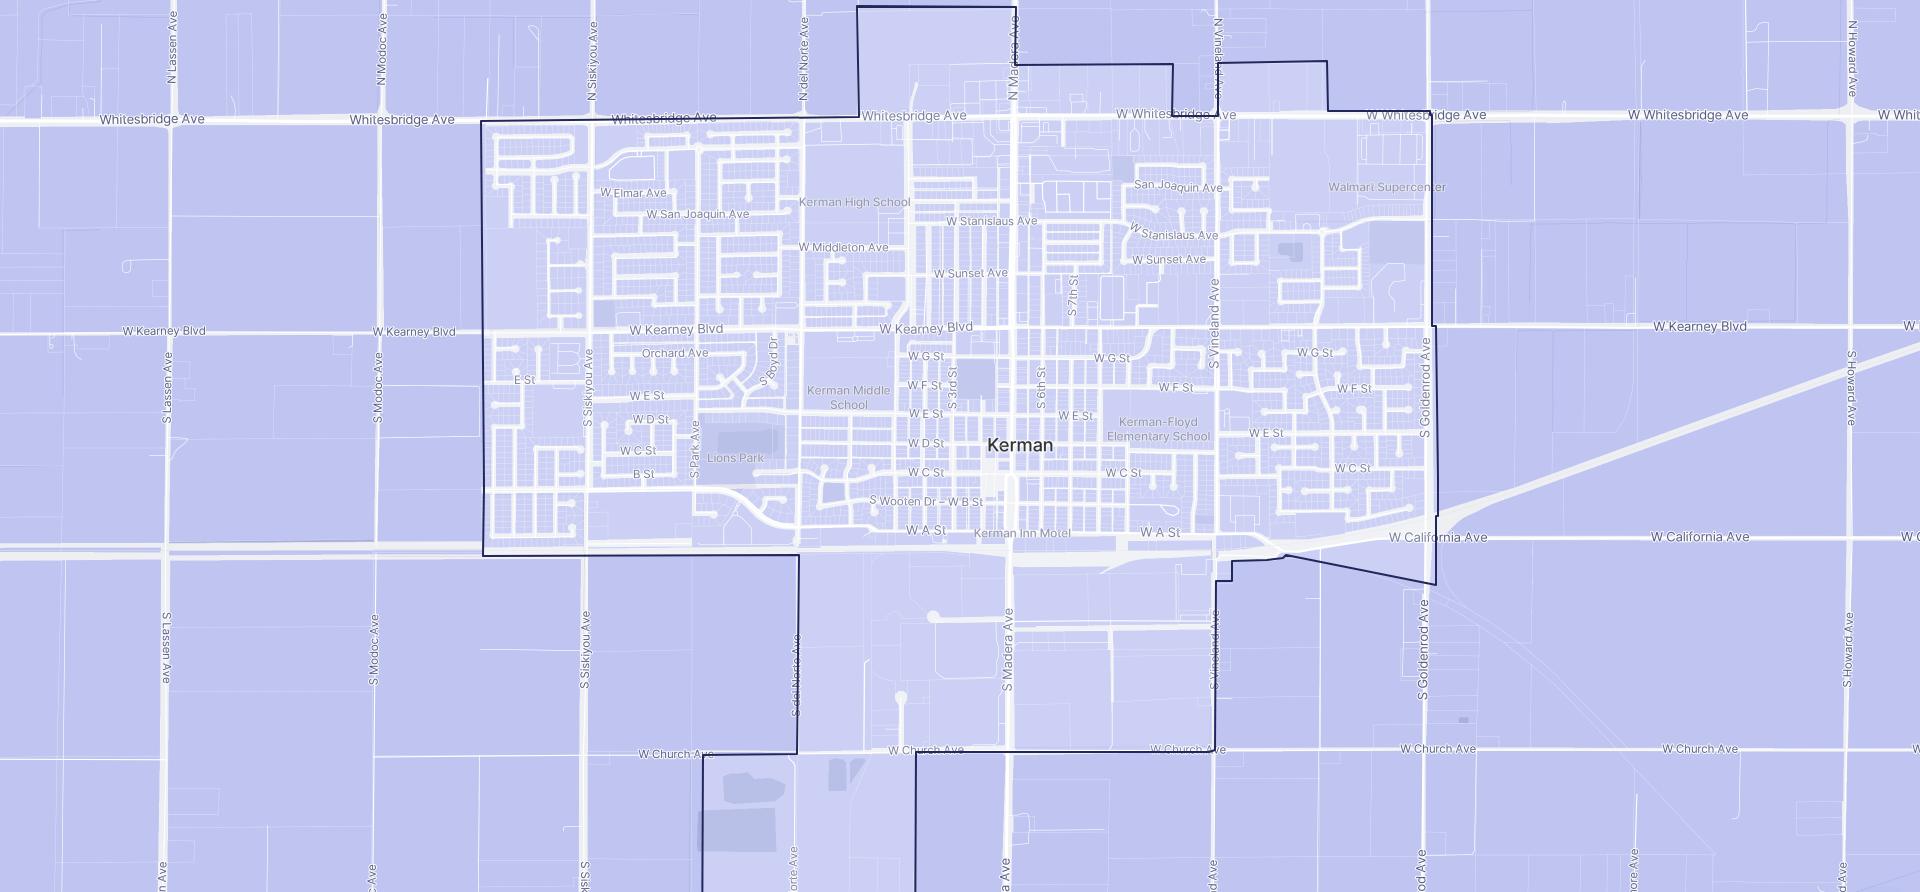 Image of Kerman boundaries on a map.